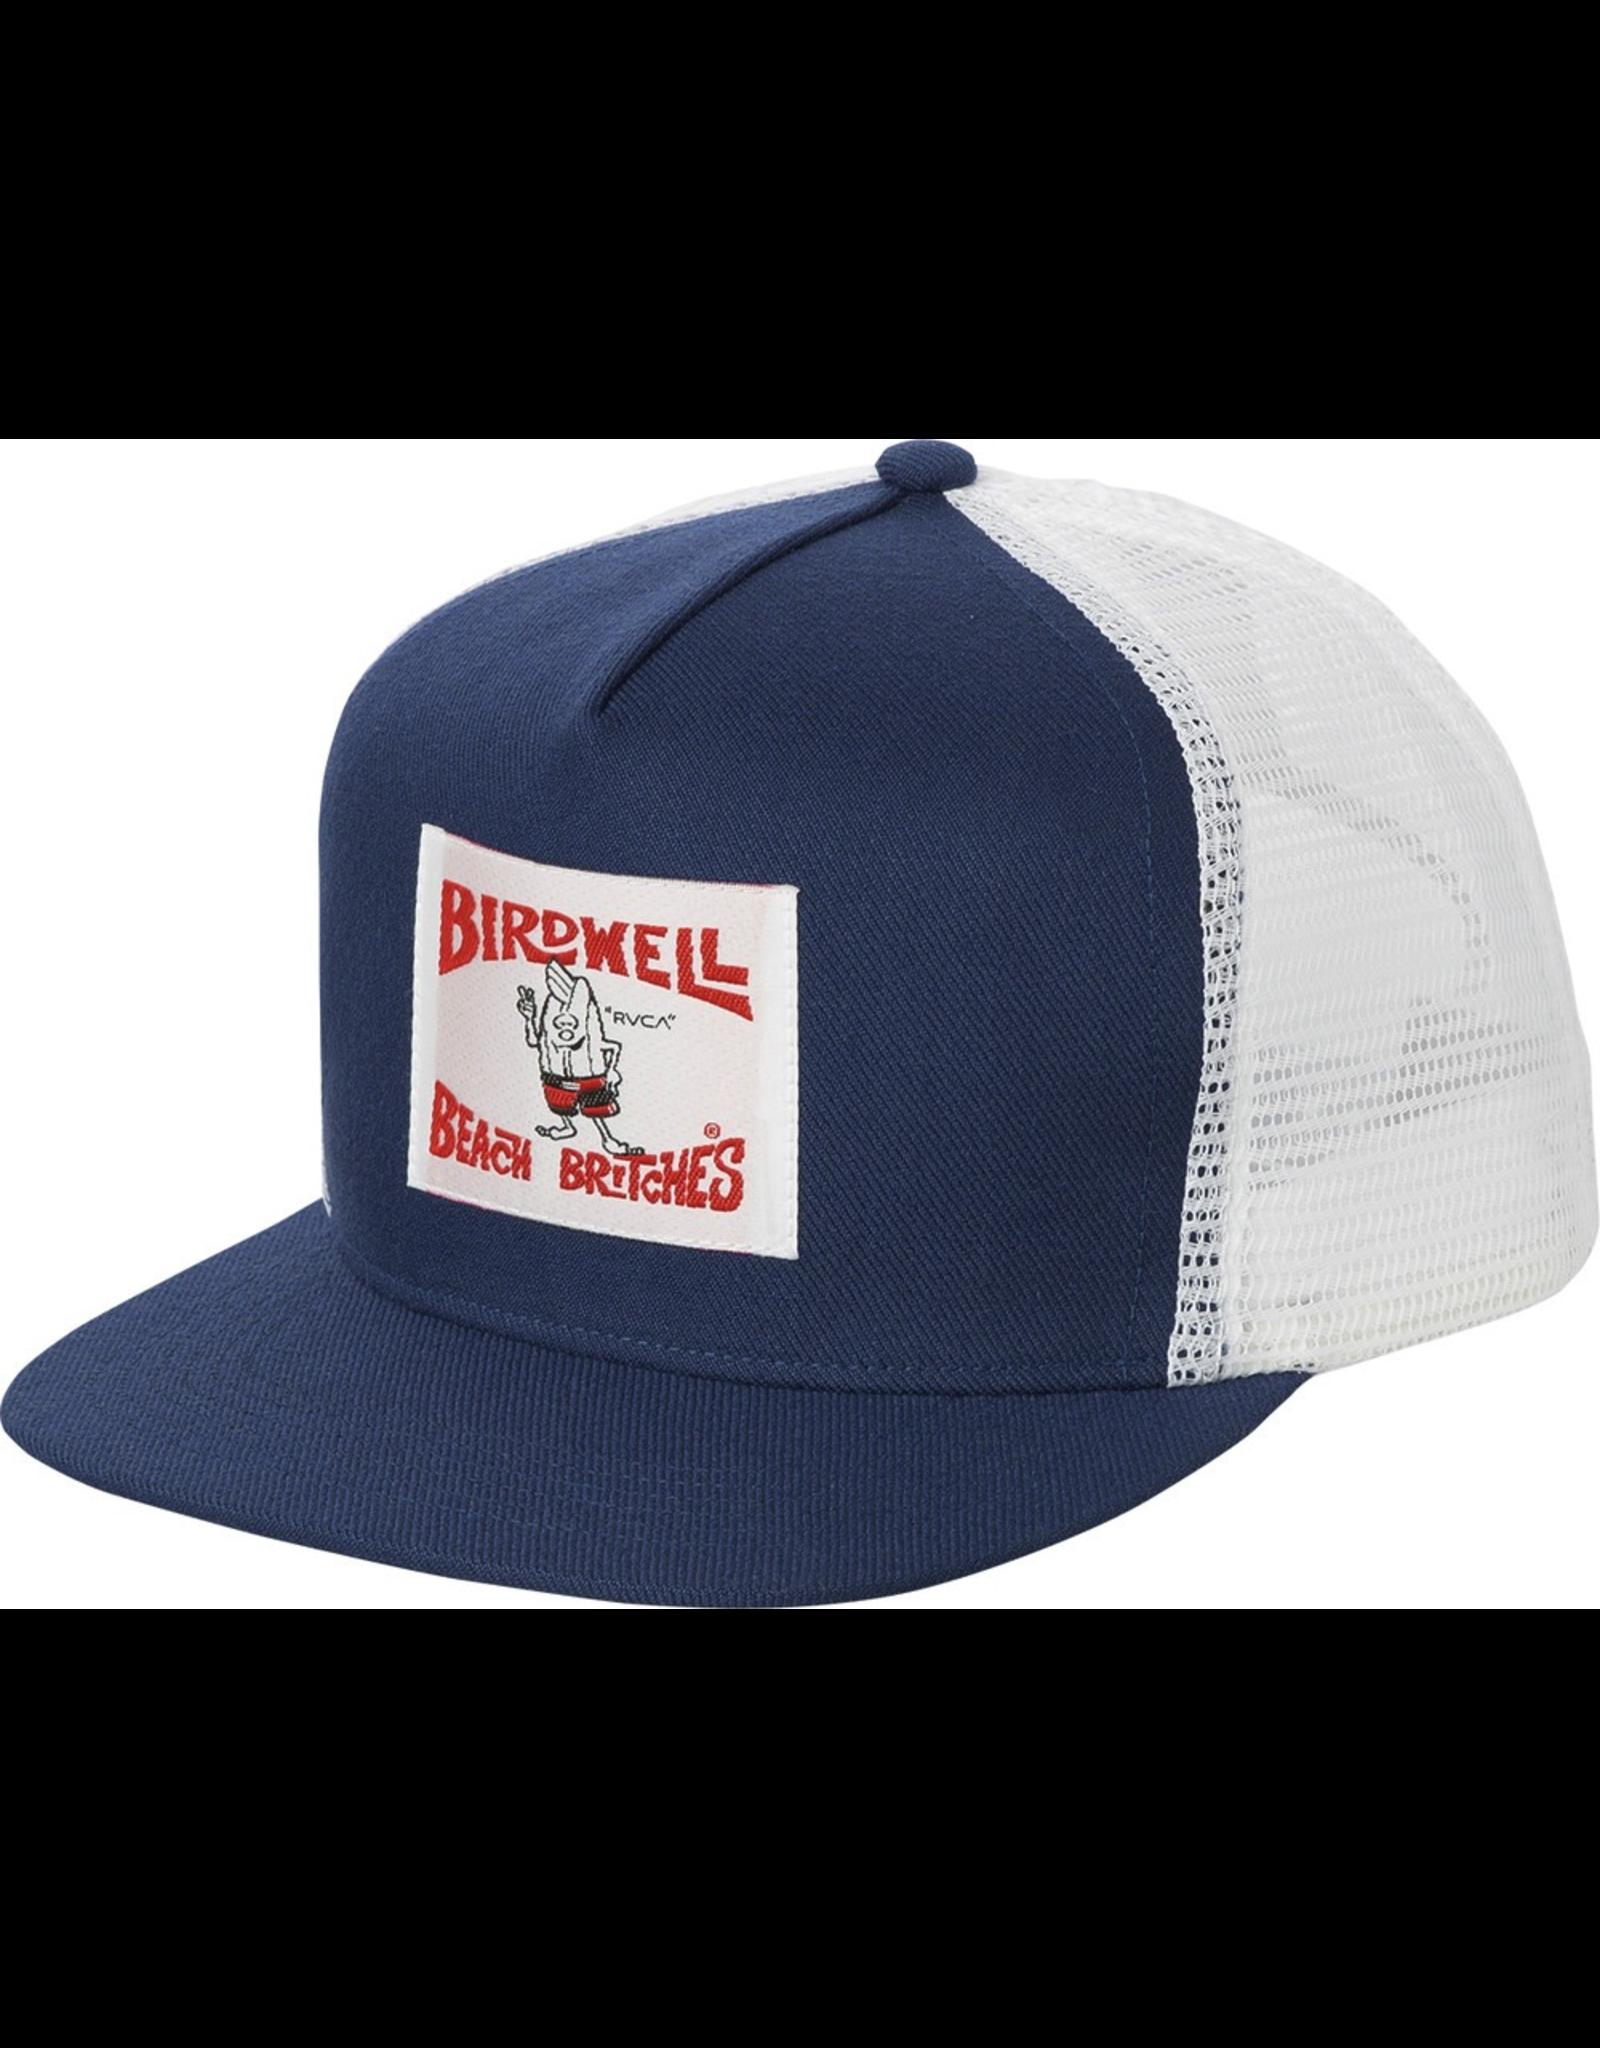 RVCA BIRDWELL BIRDIE TRUCKER HAT